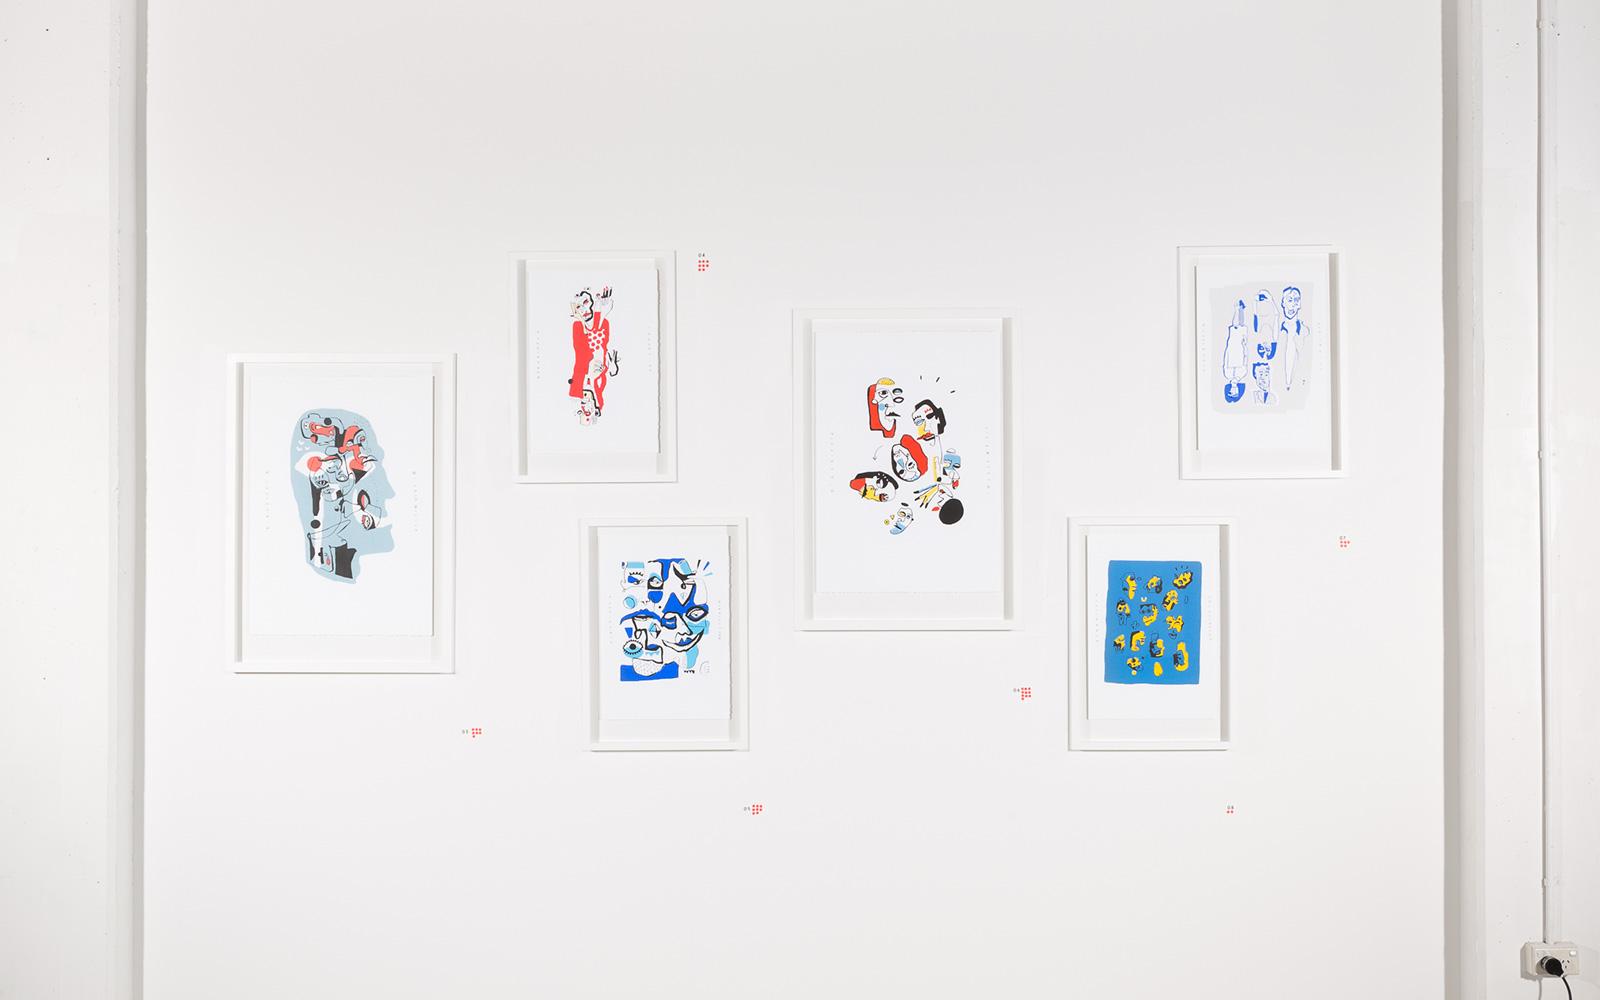 Print wall 1/10 editions